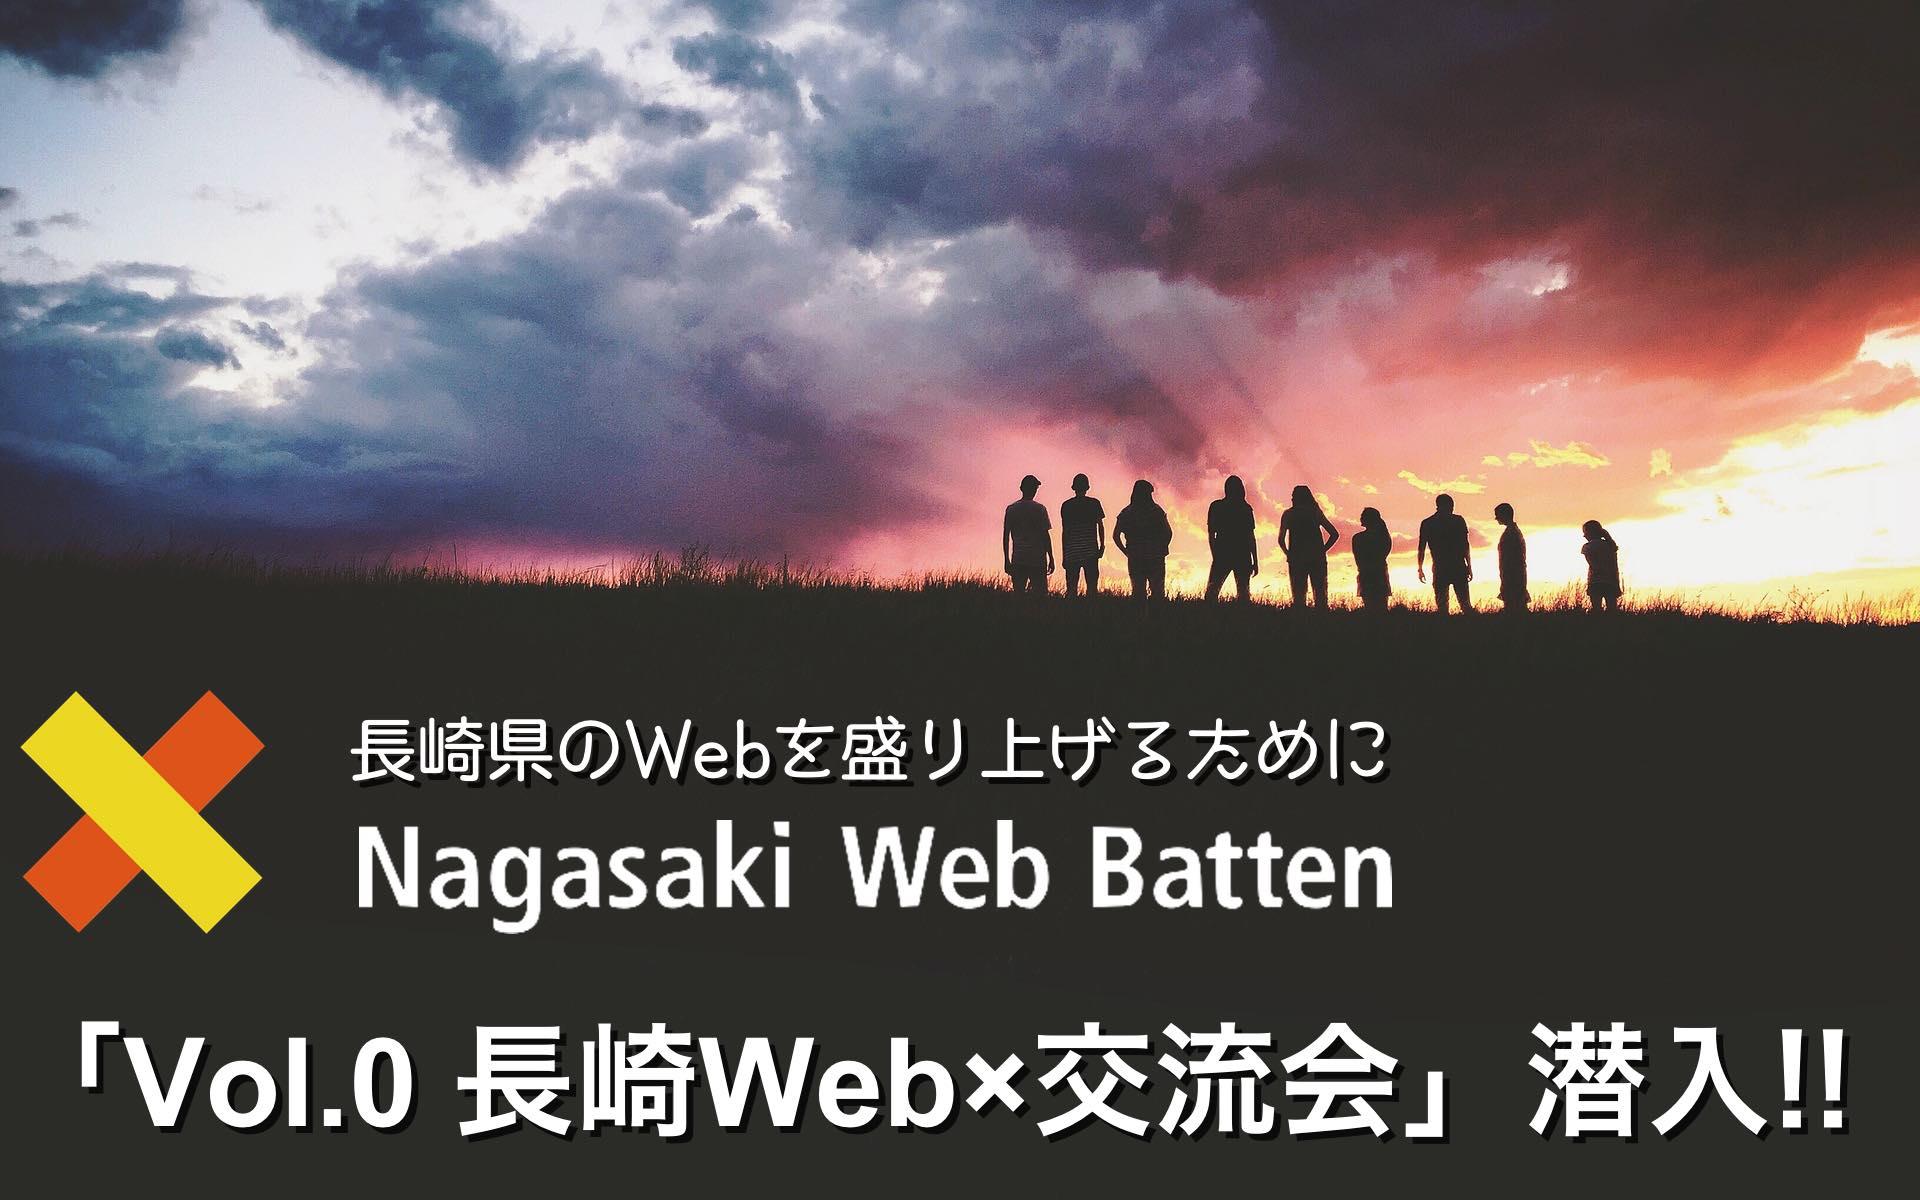 nagasakiwebbattenevent